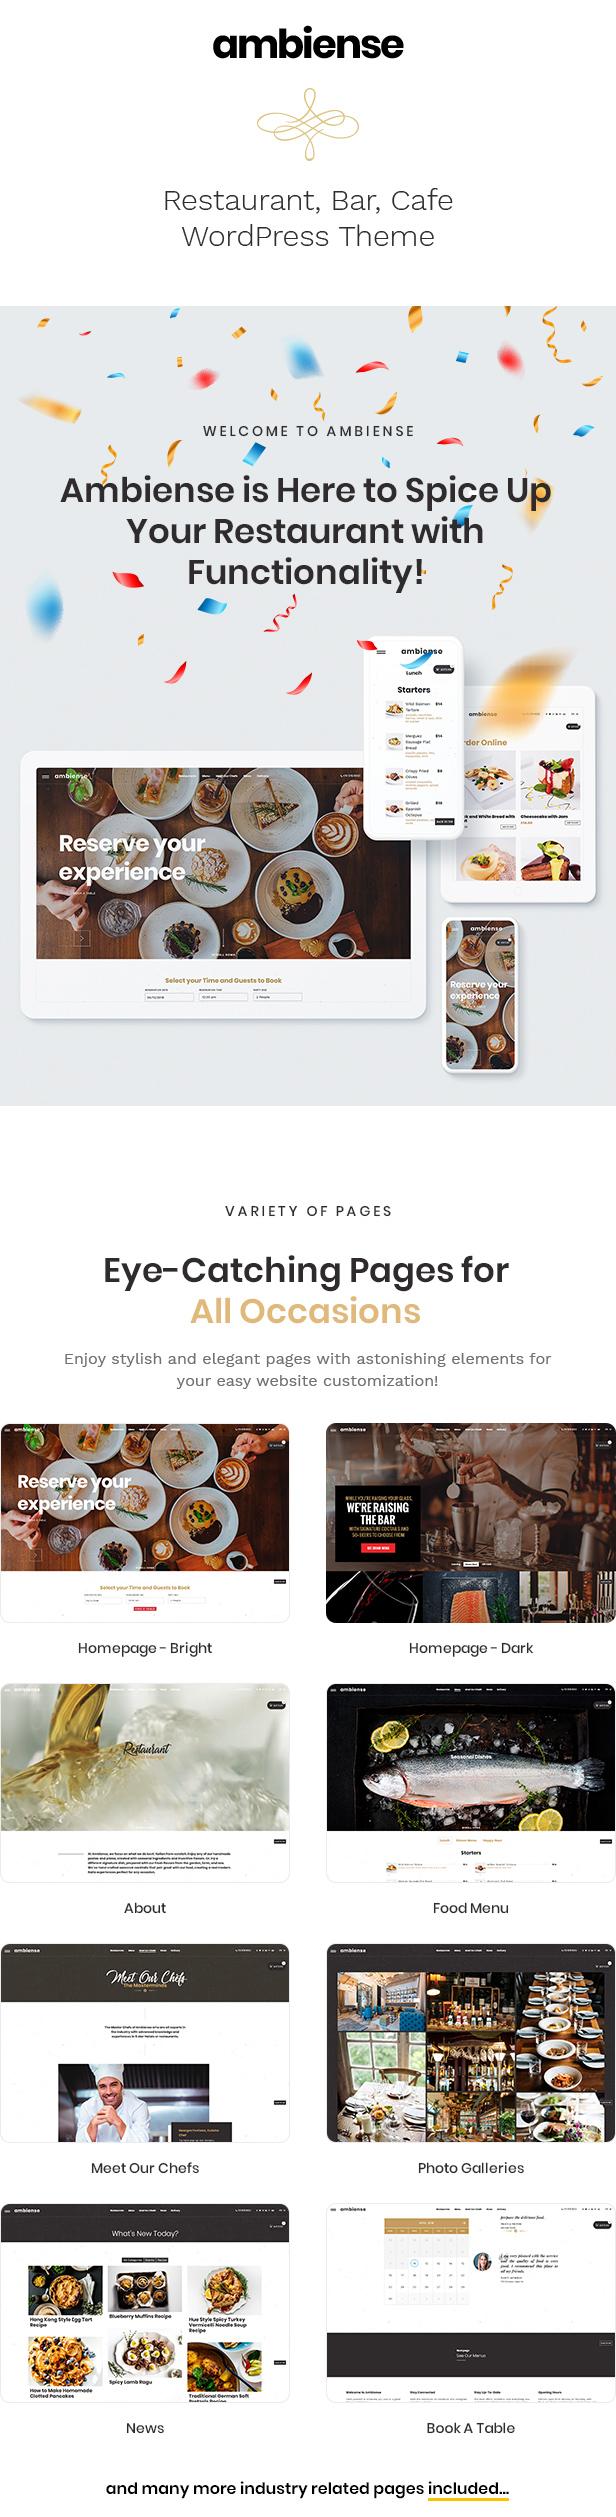 Ambiense - Restaurant & Cafe WordPress Theme - 1